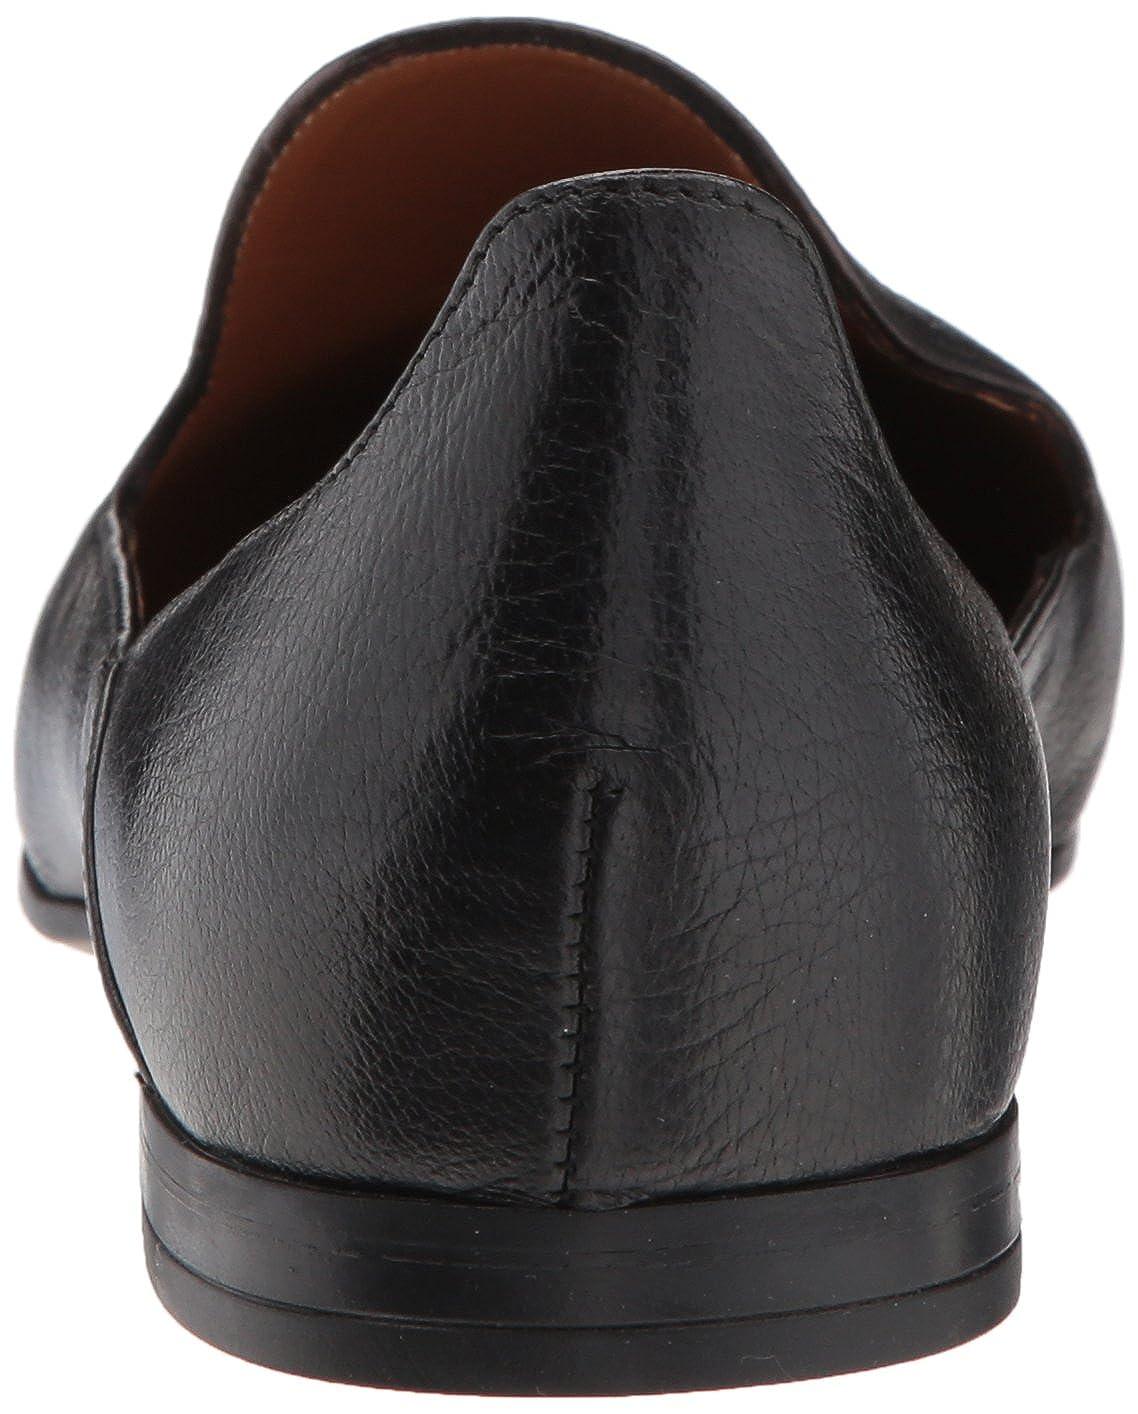 Aquatalia Womens Emmaline Metallic Calf Loafer